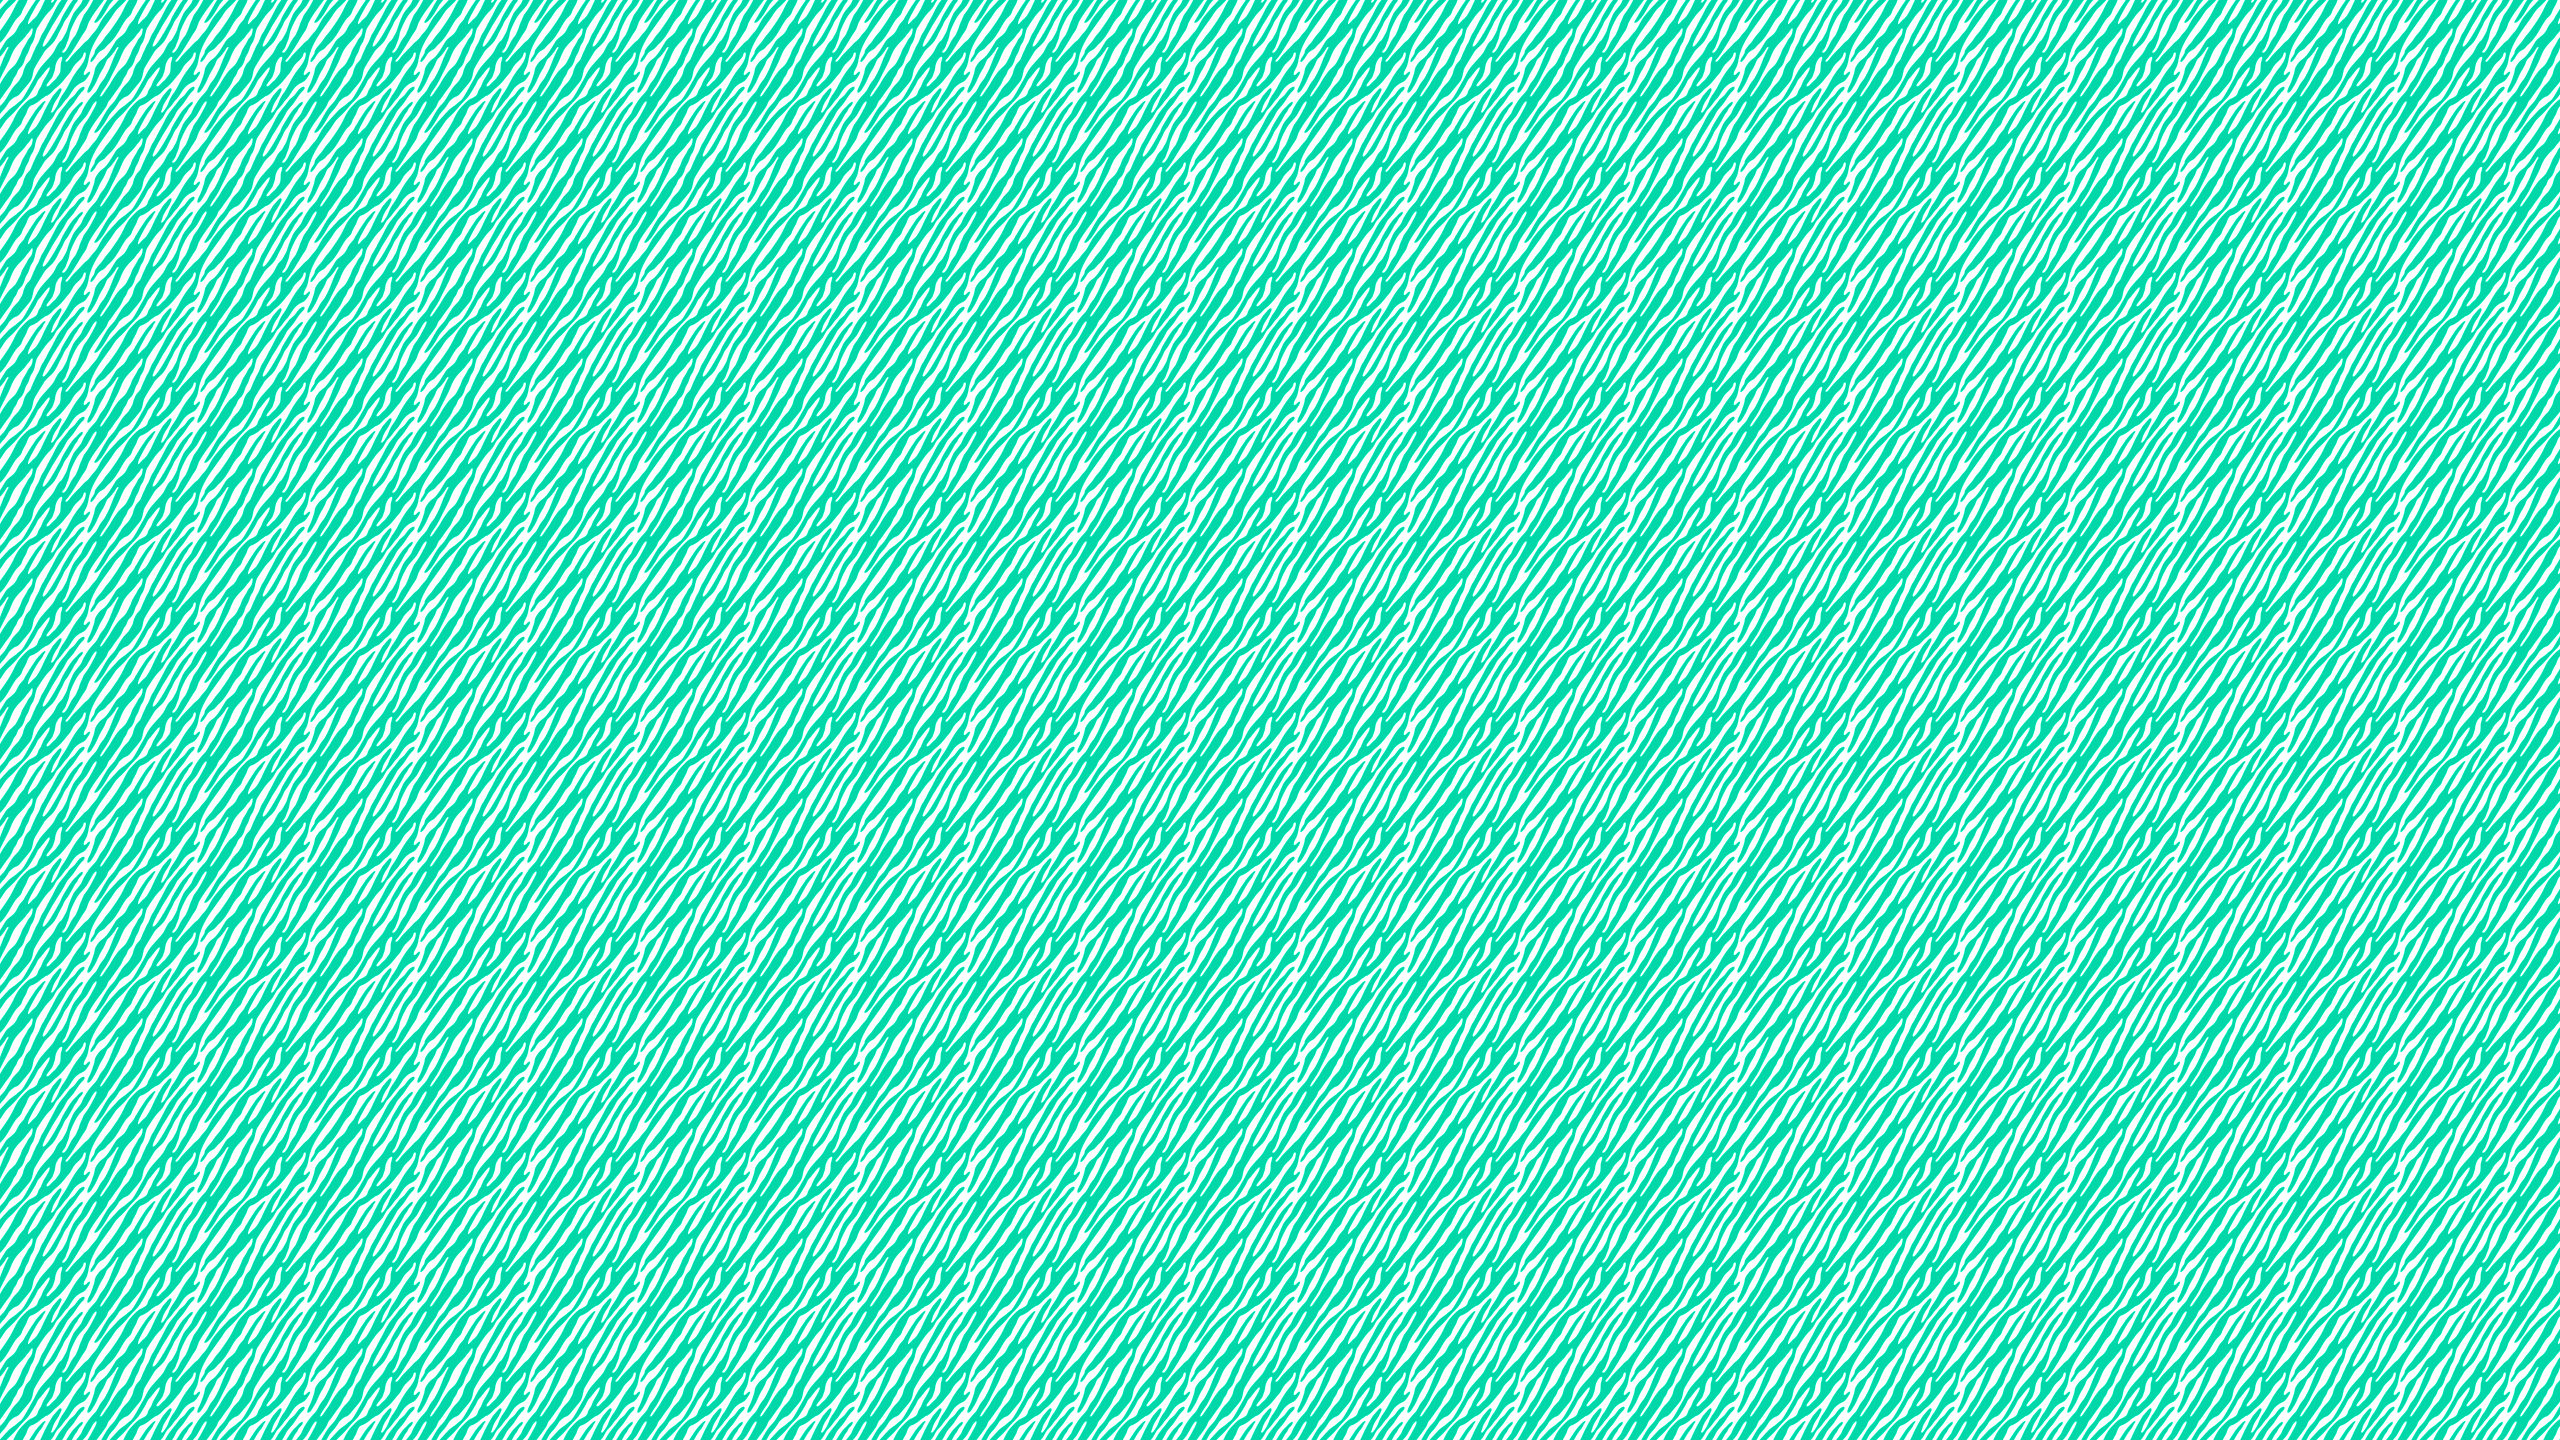 Cool Teal Desktop Wallpaper 2560x1440